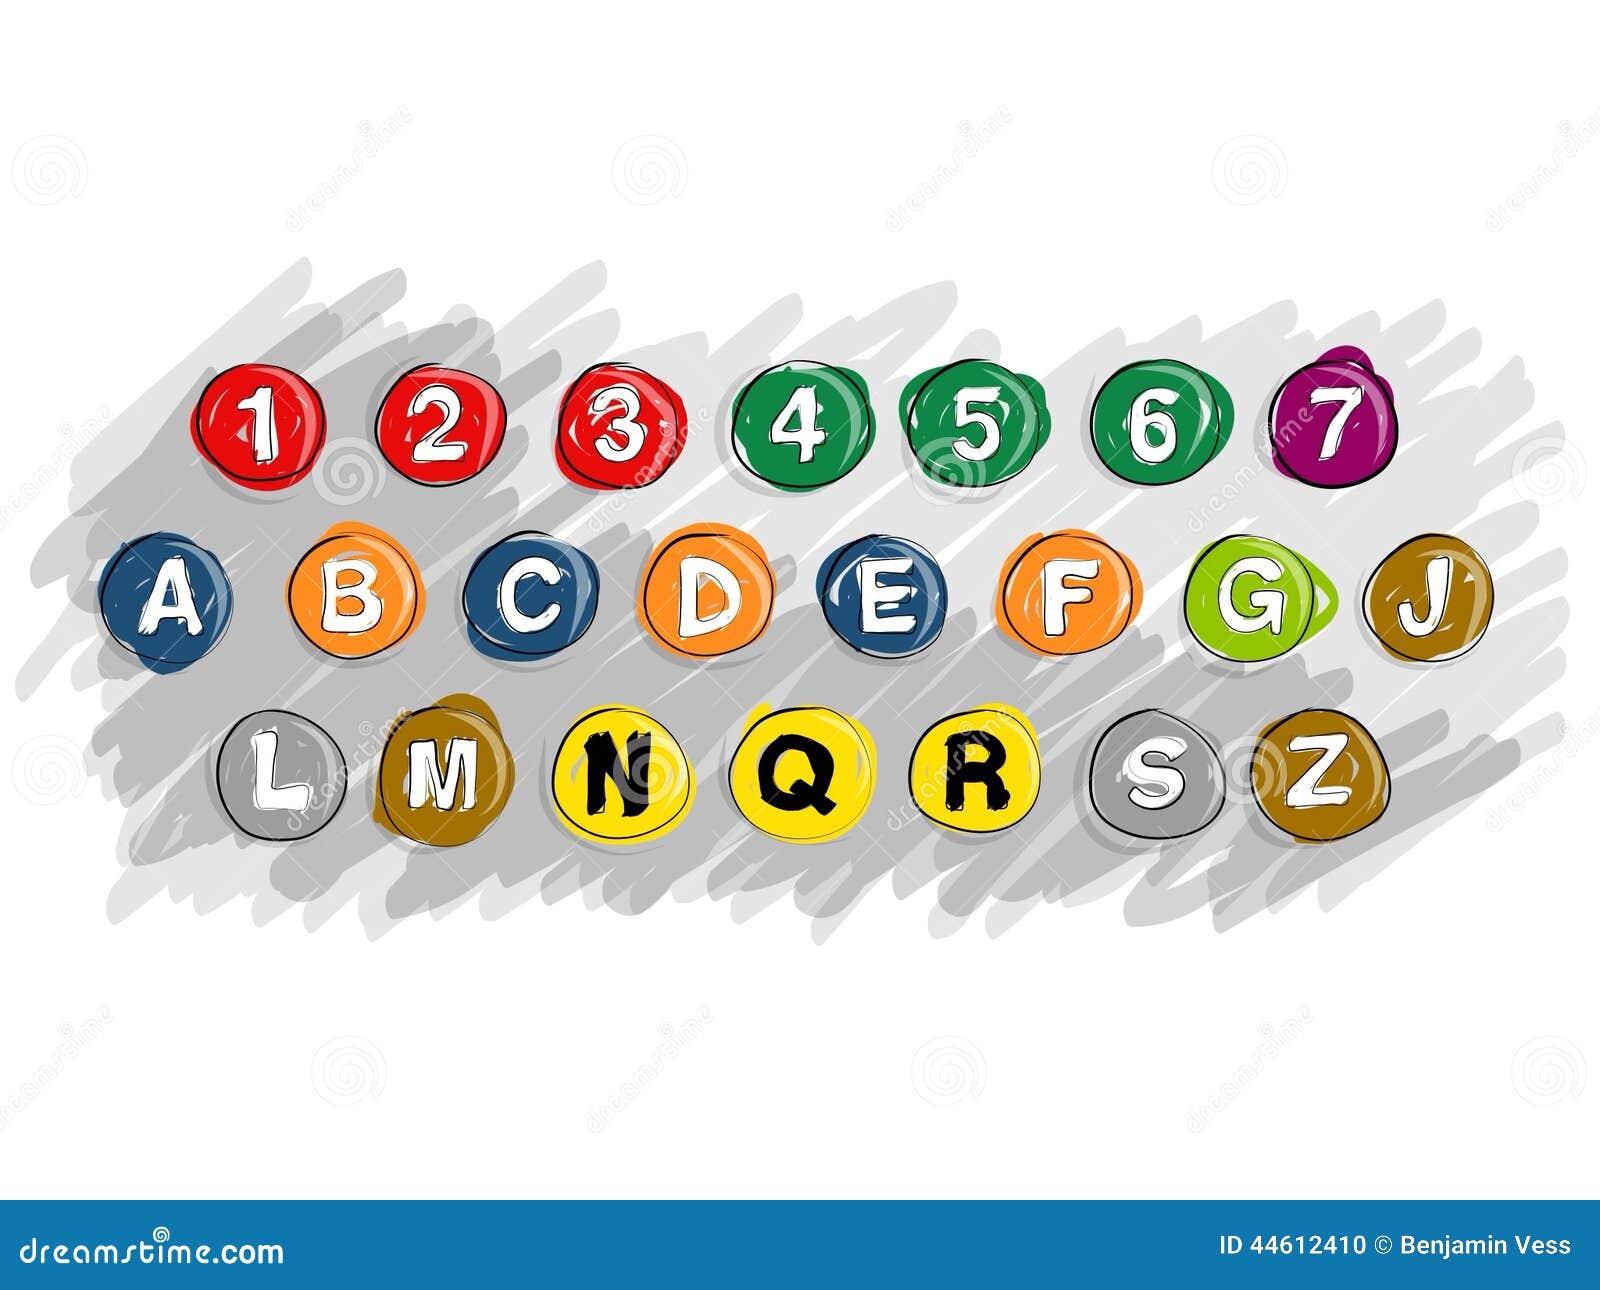 Nyc subway lines editorial image image of york subway 44612410 nyc subway lines biocorpaavc Gallery